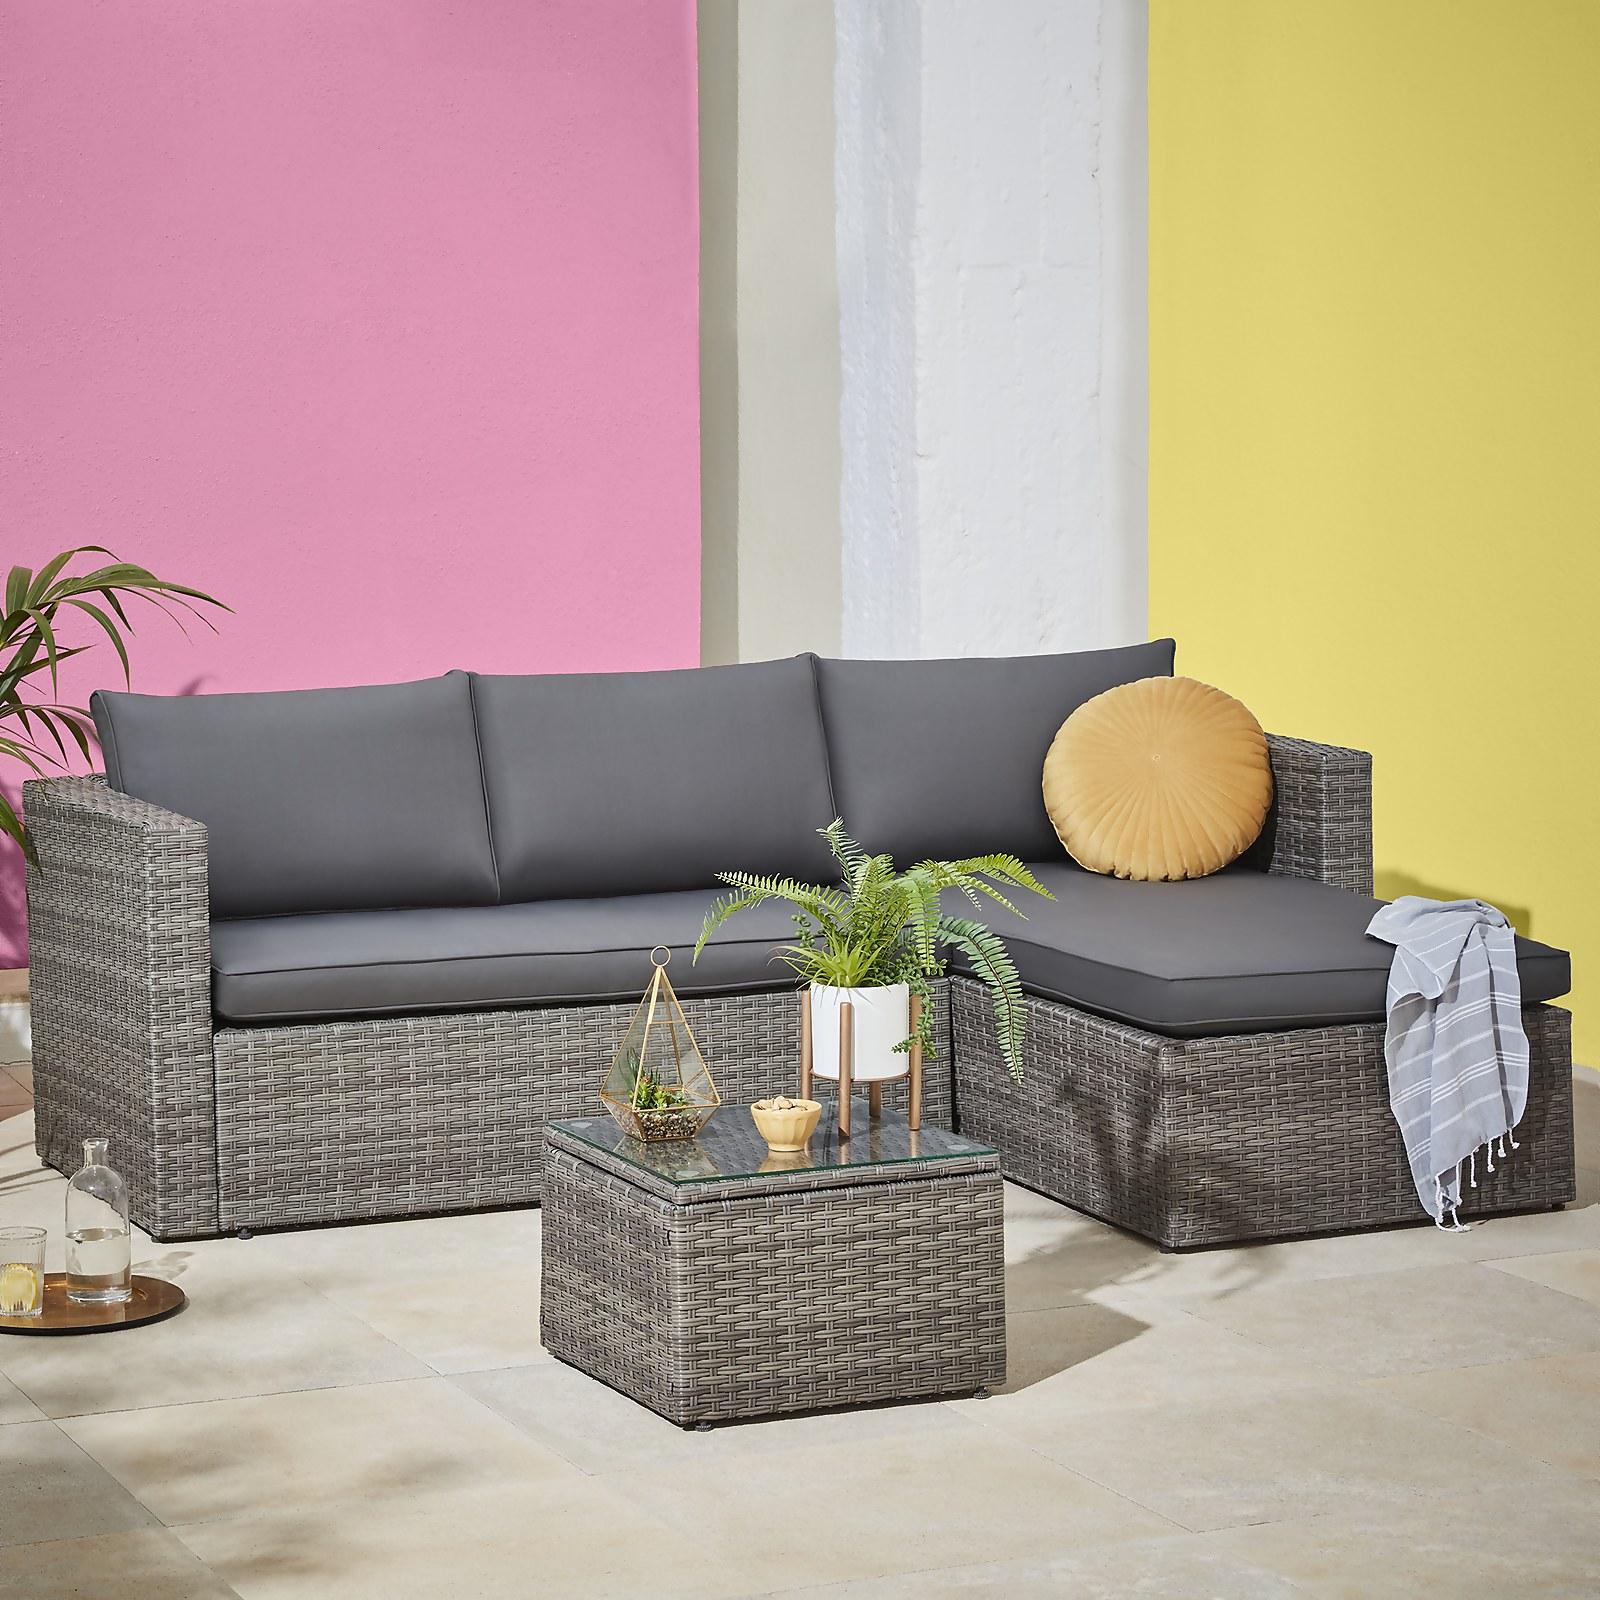 Homebase Alexandria 4 Seater Garden Corner Sofa - Grey